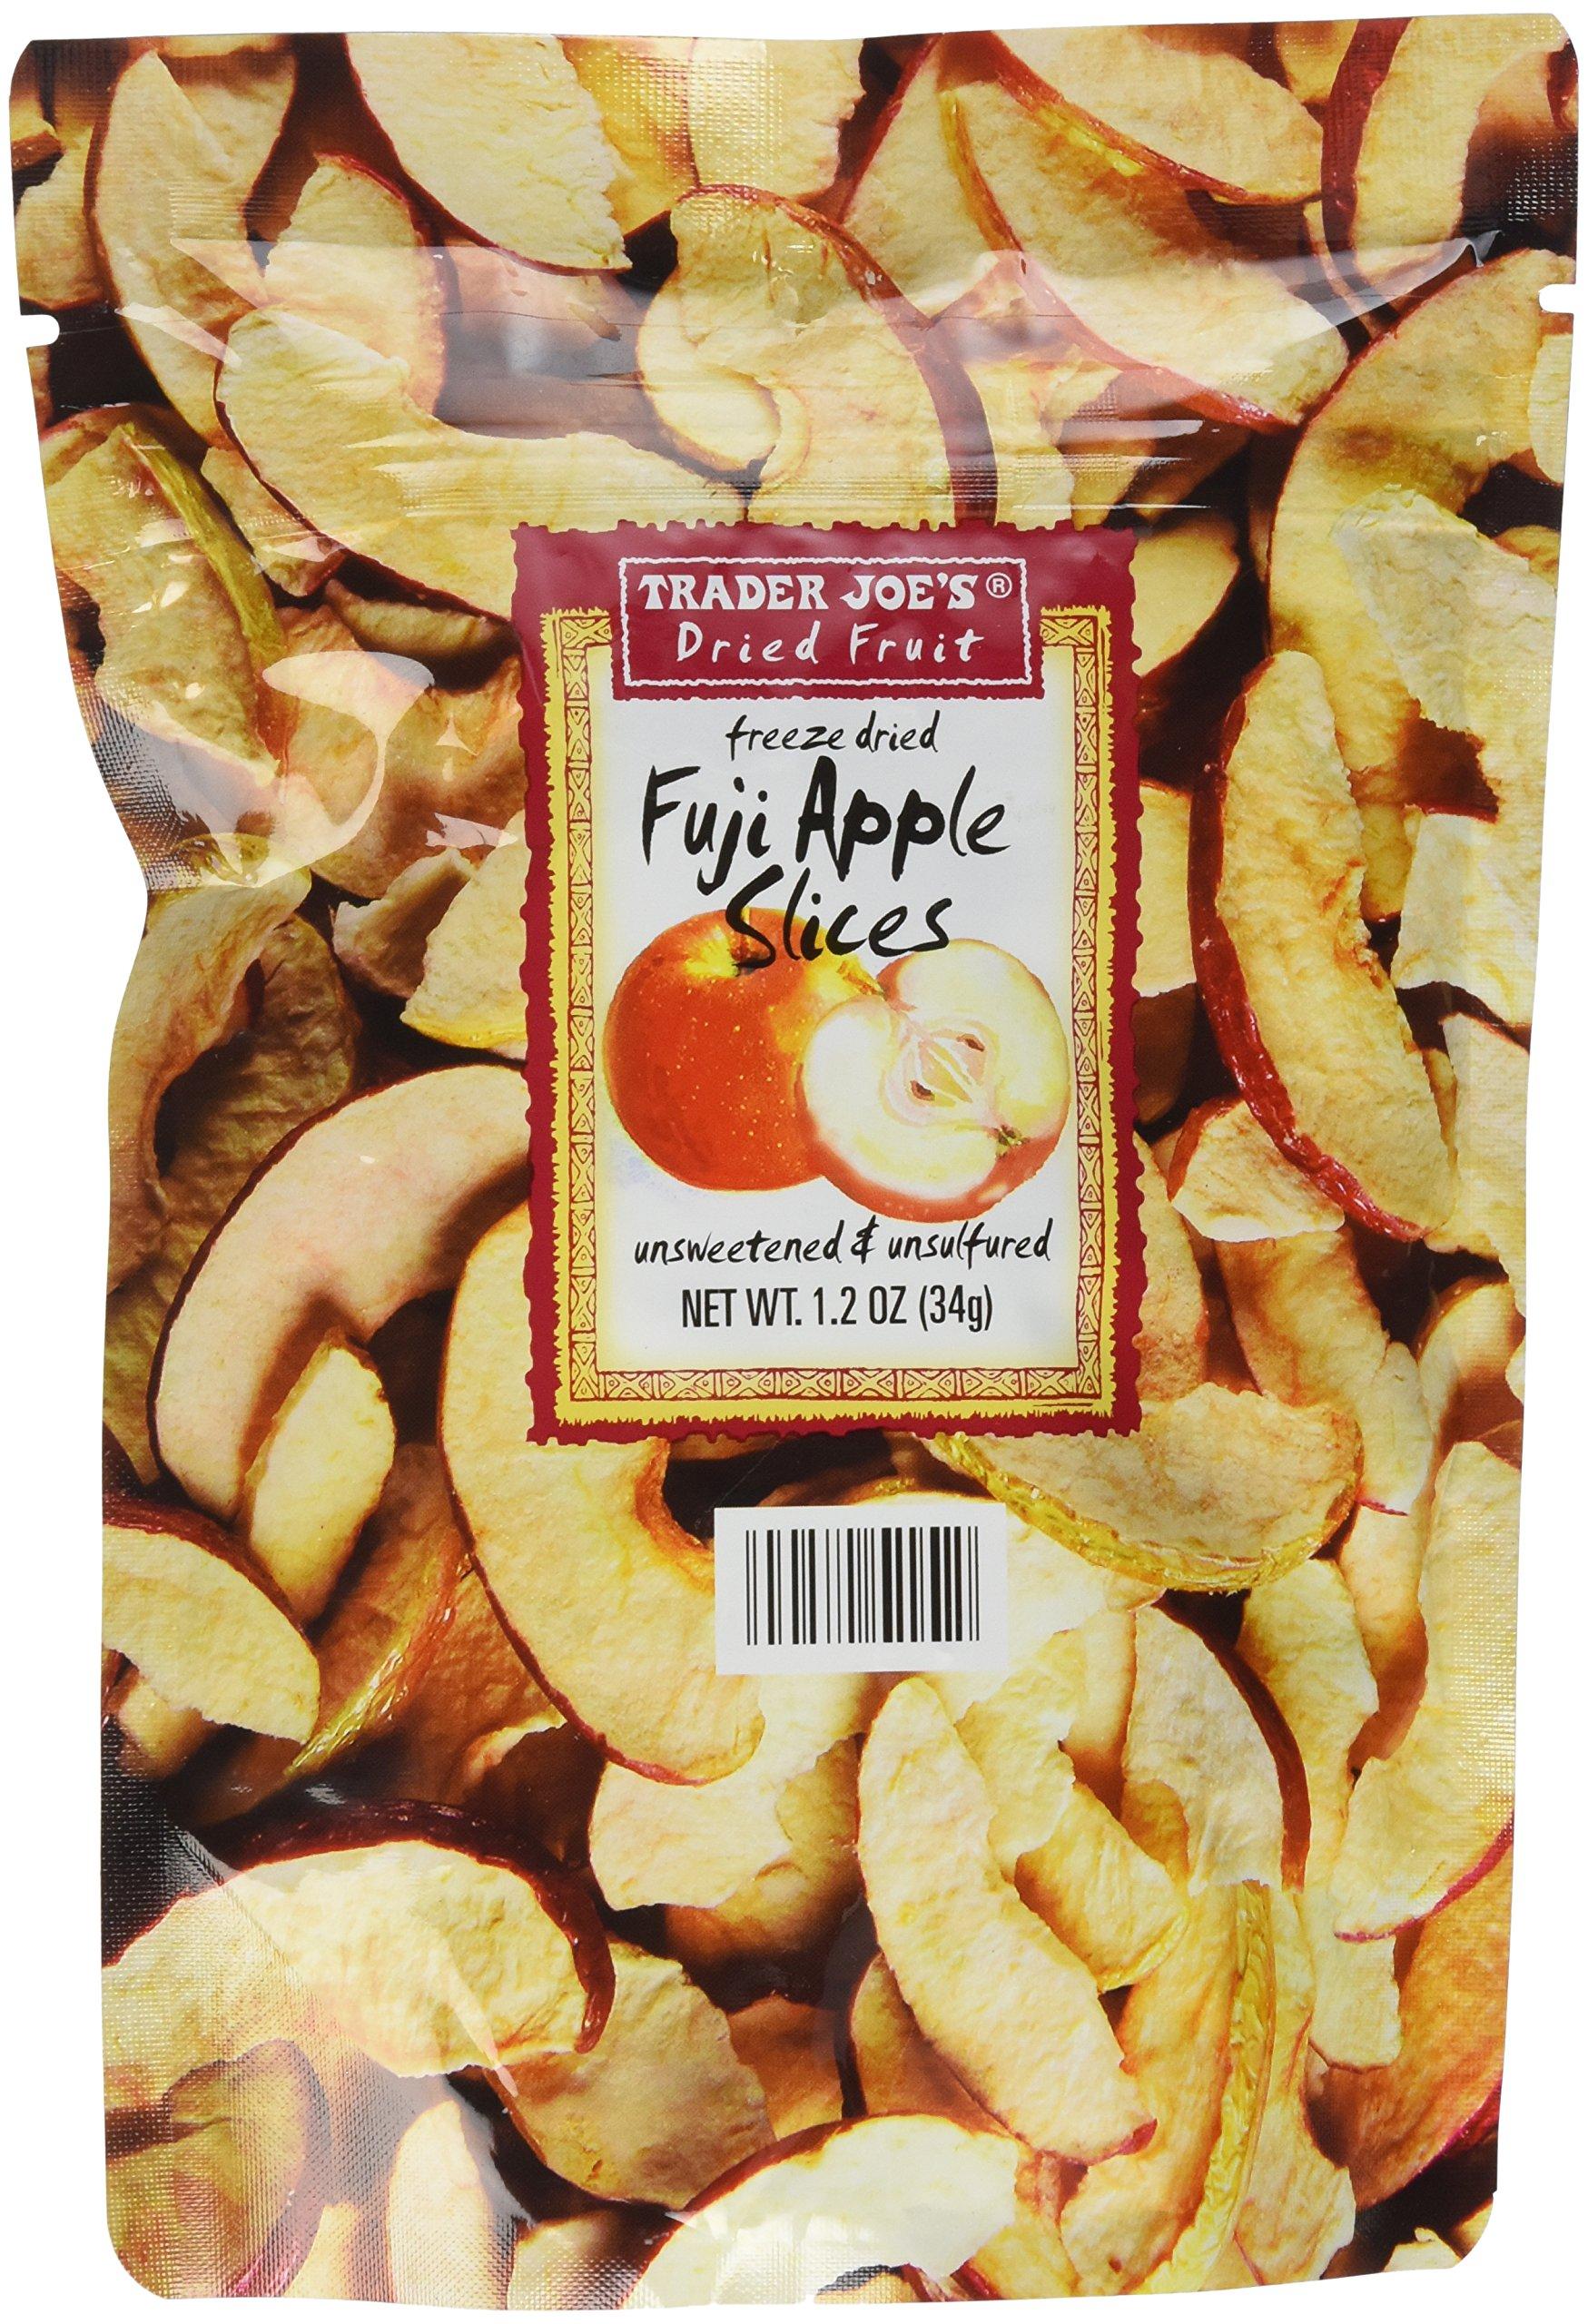 Freeze Dried Fuji Apple Slices